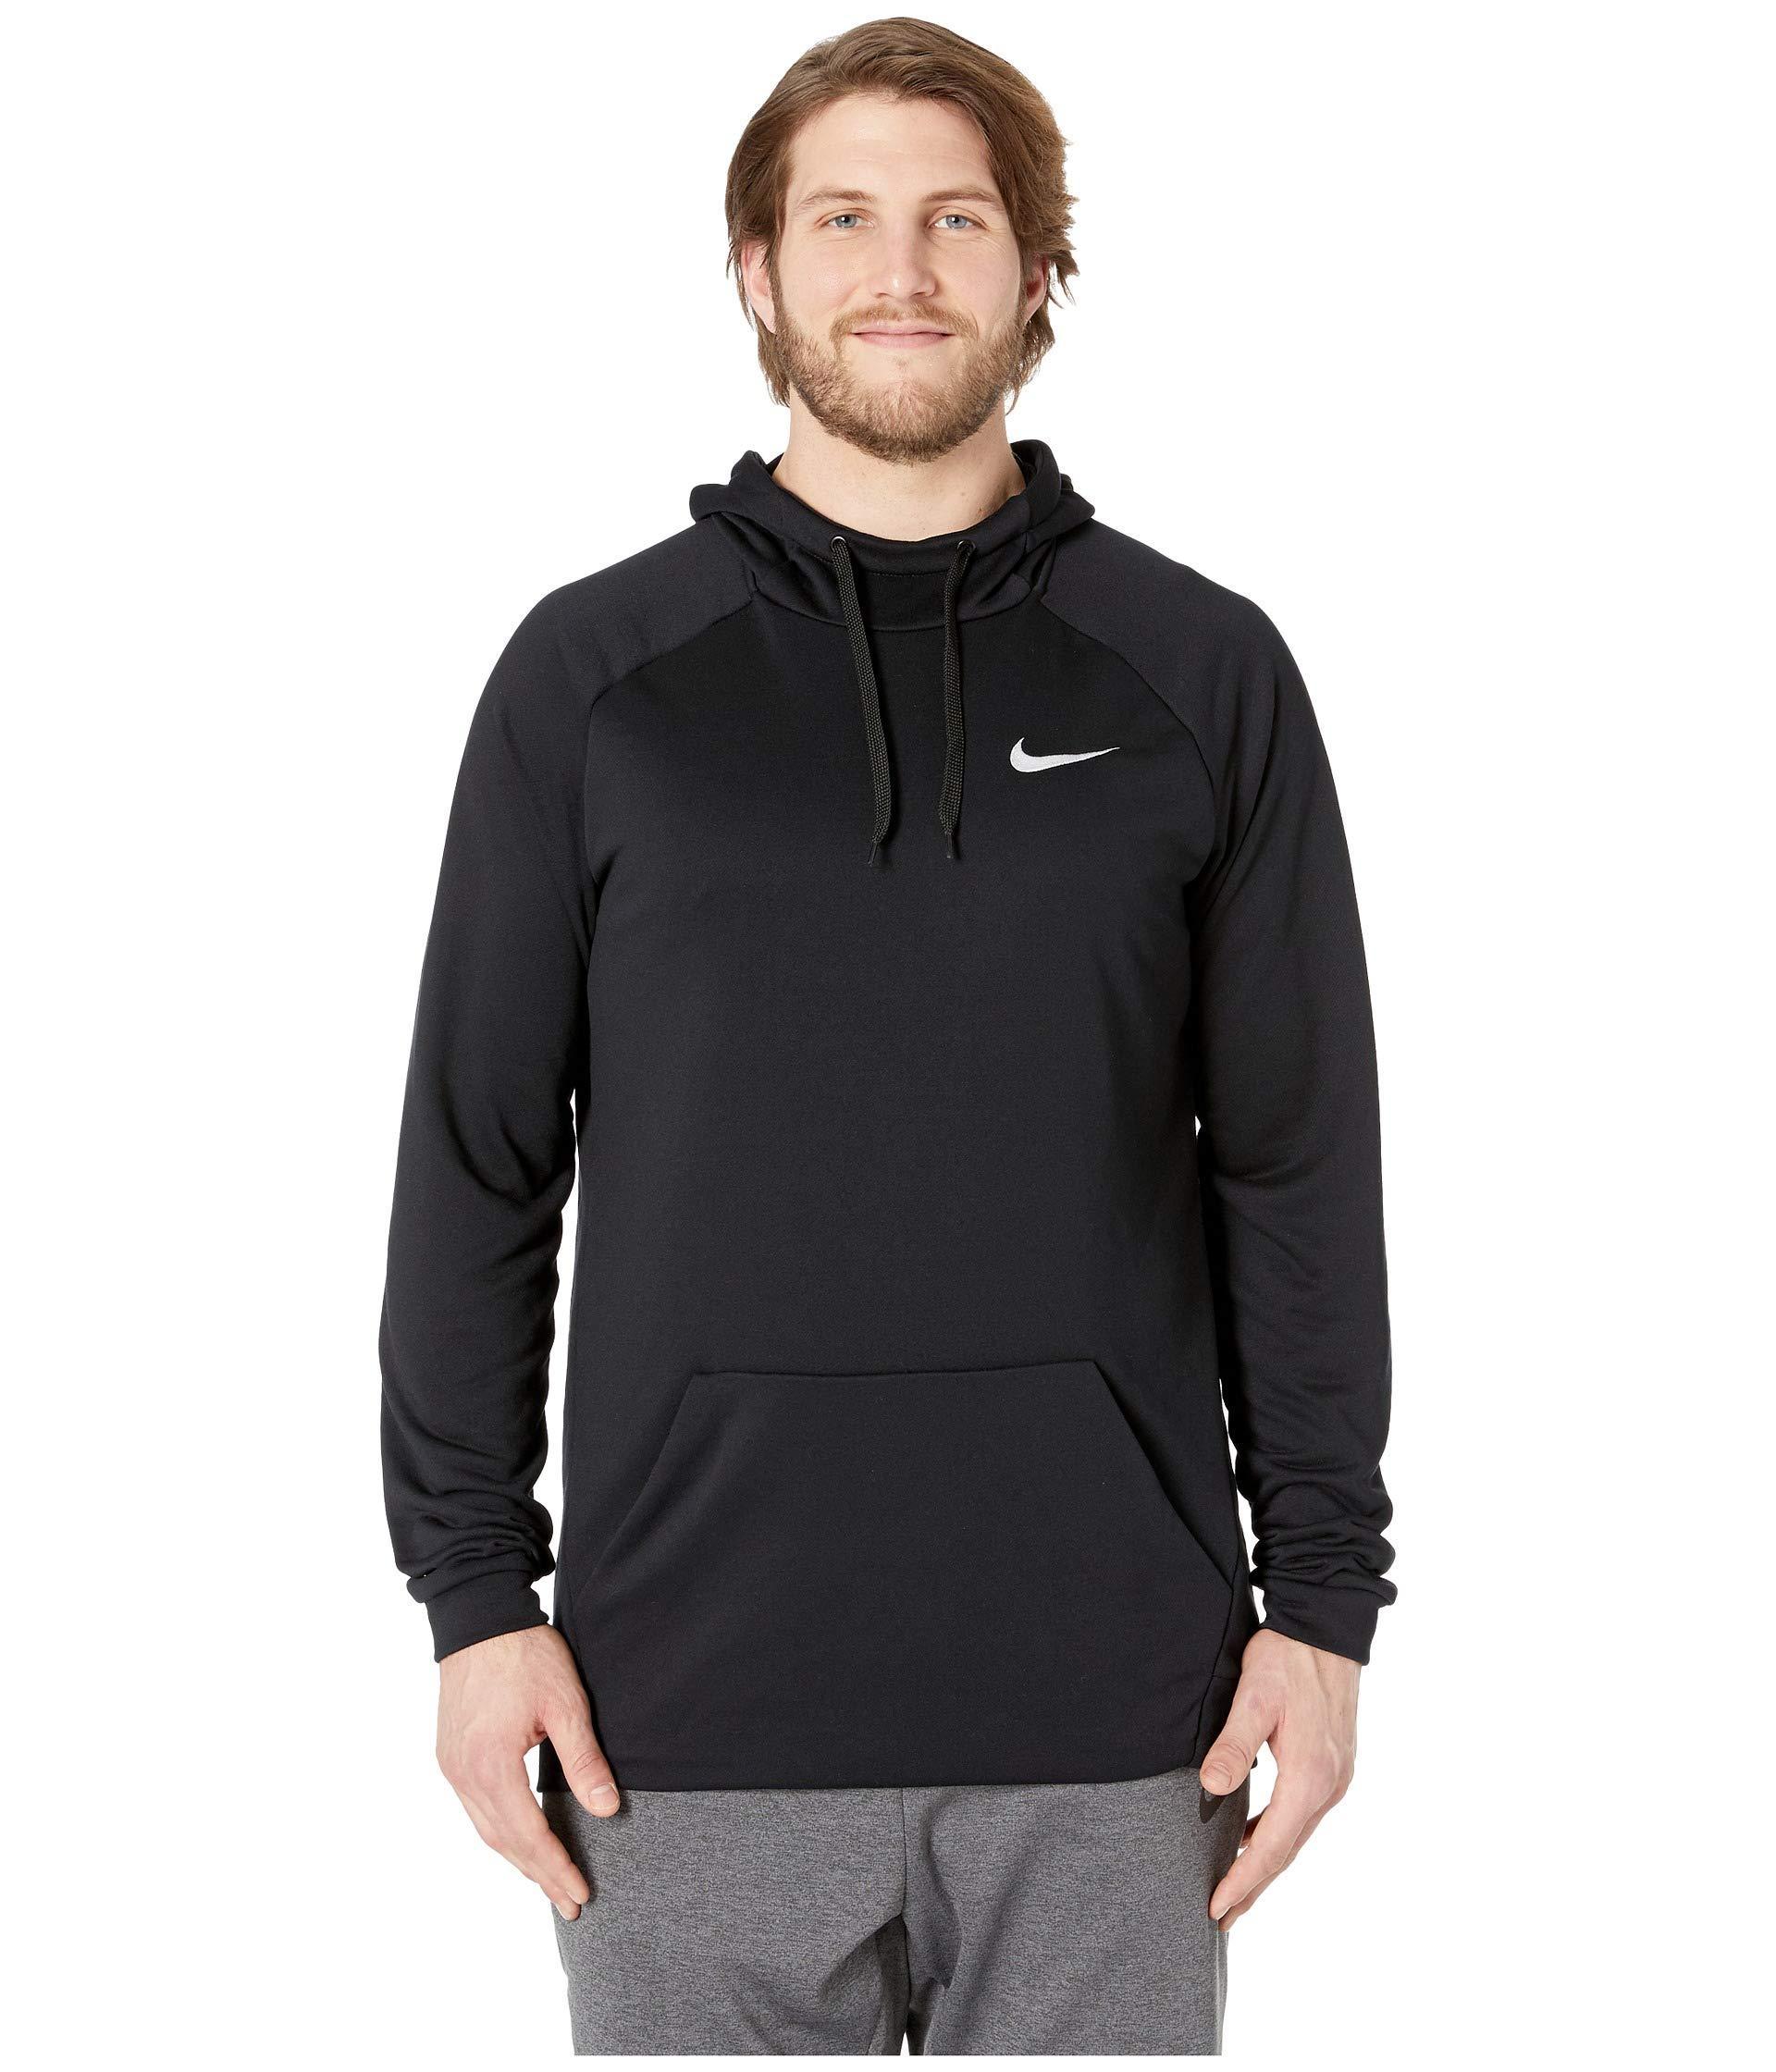 35281d66fa Lyst - Nike Big Tall Dry Hoodie Pullover Fleece (black white) Men s ...